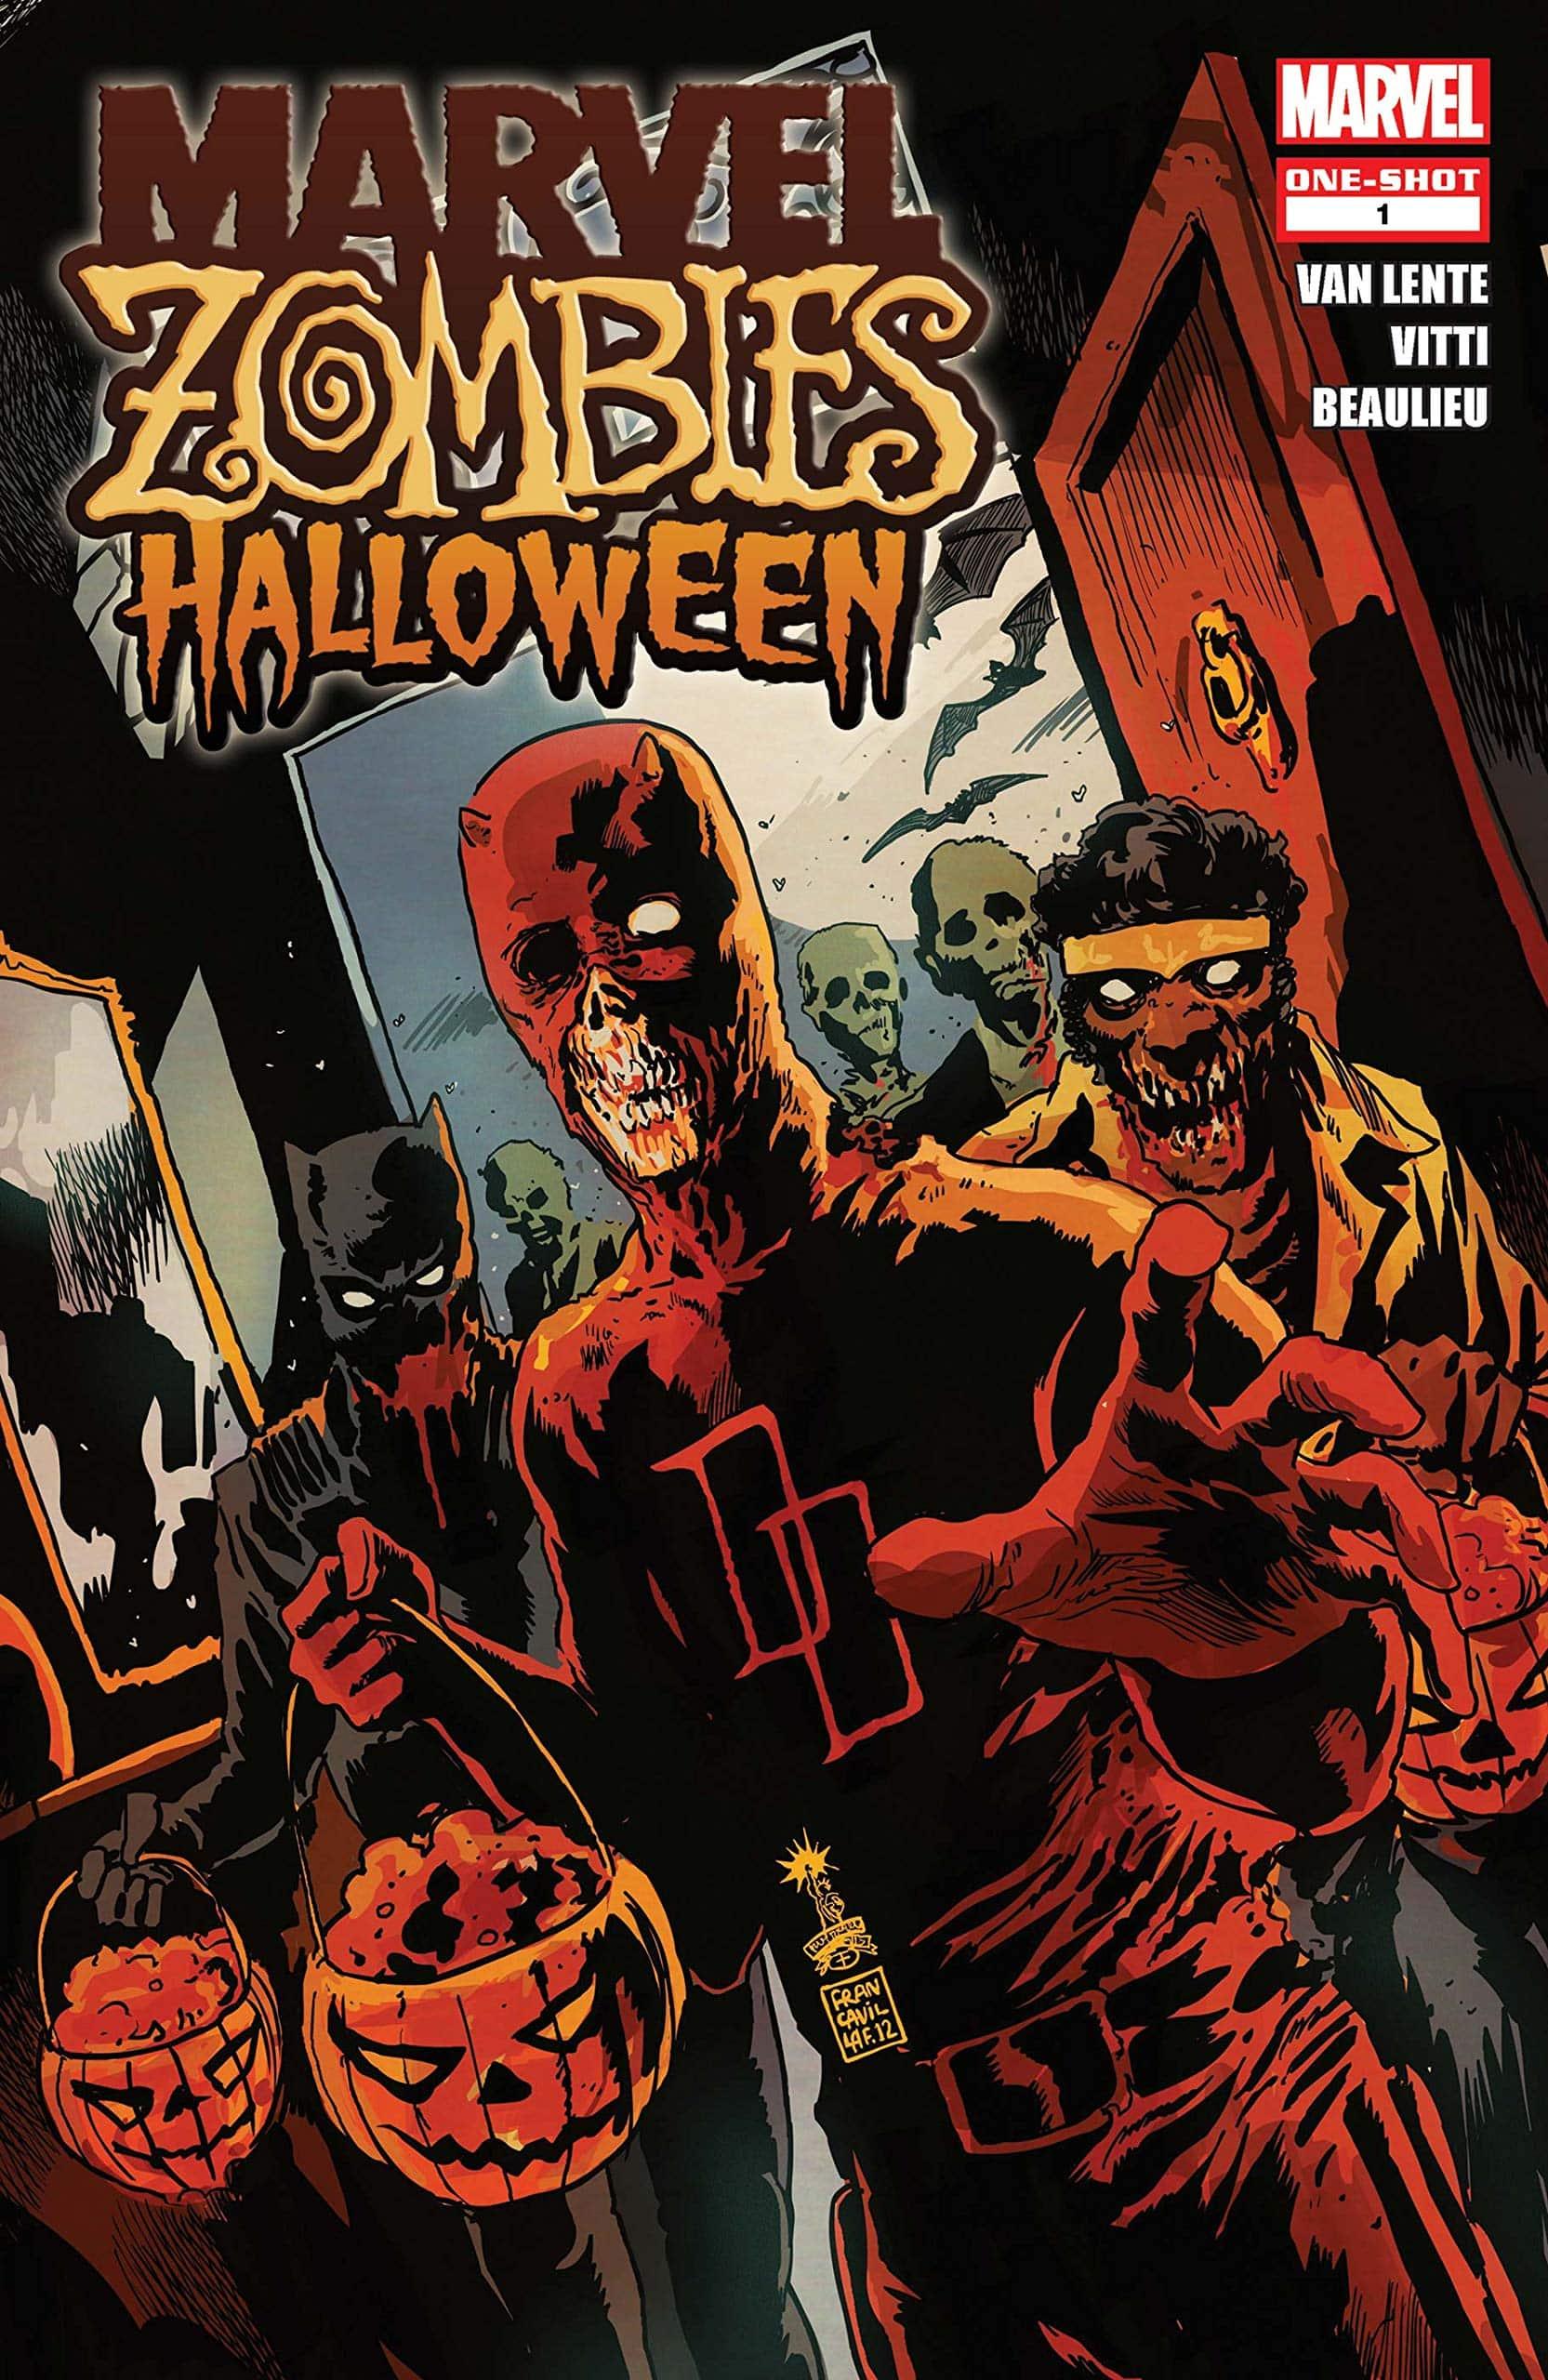 Marvel One-Shot cover